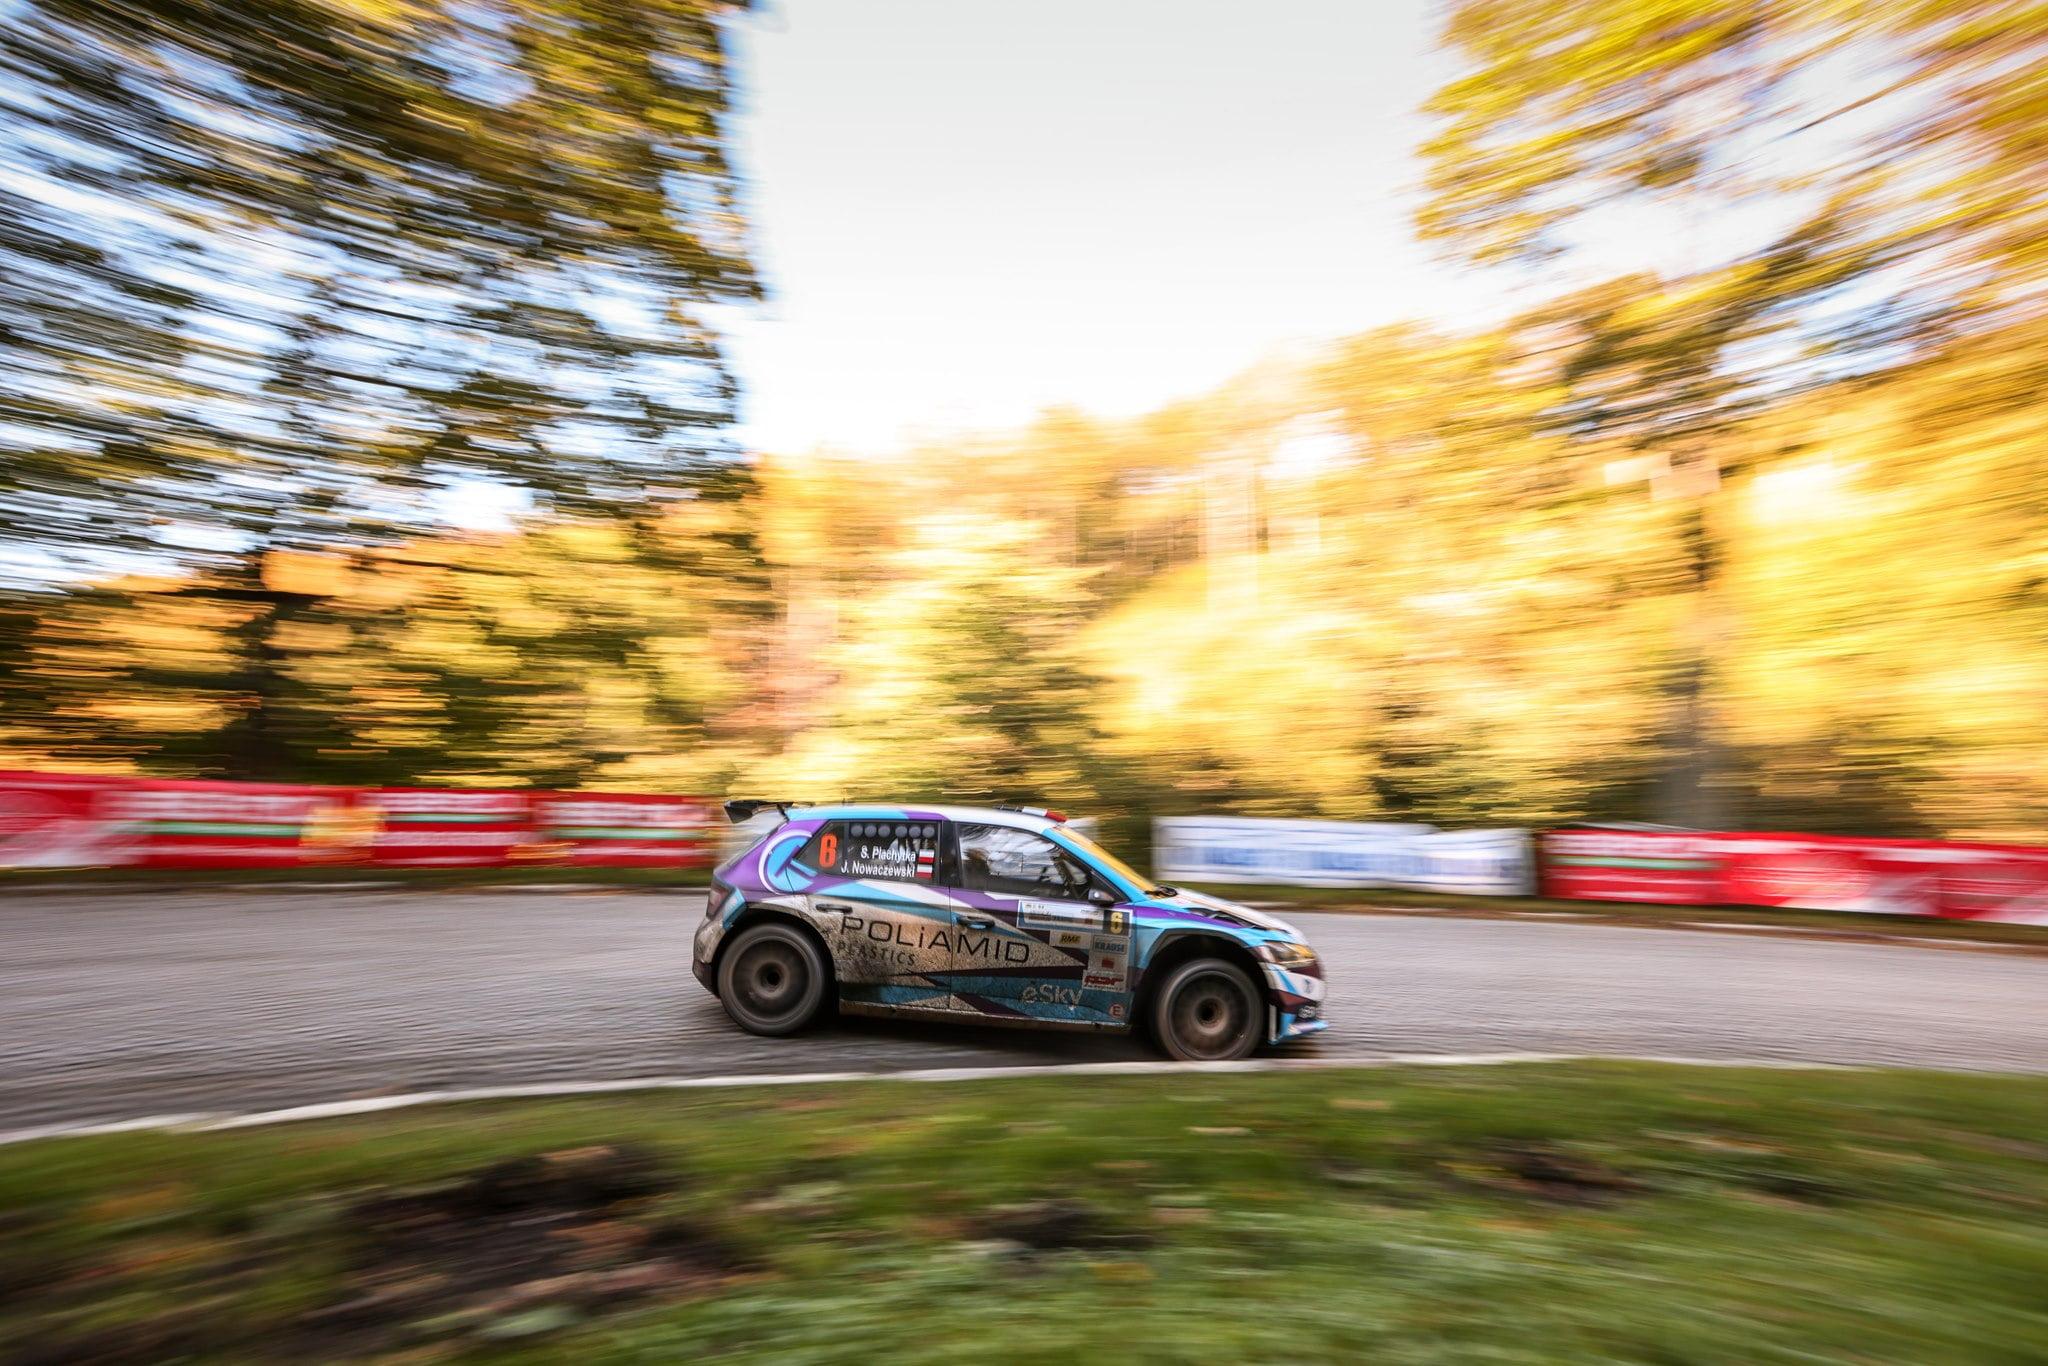 Poliamid Rally Team Fabia R5 2020